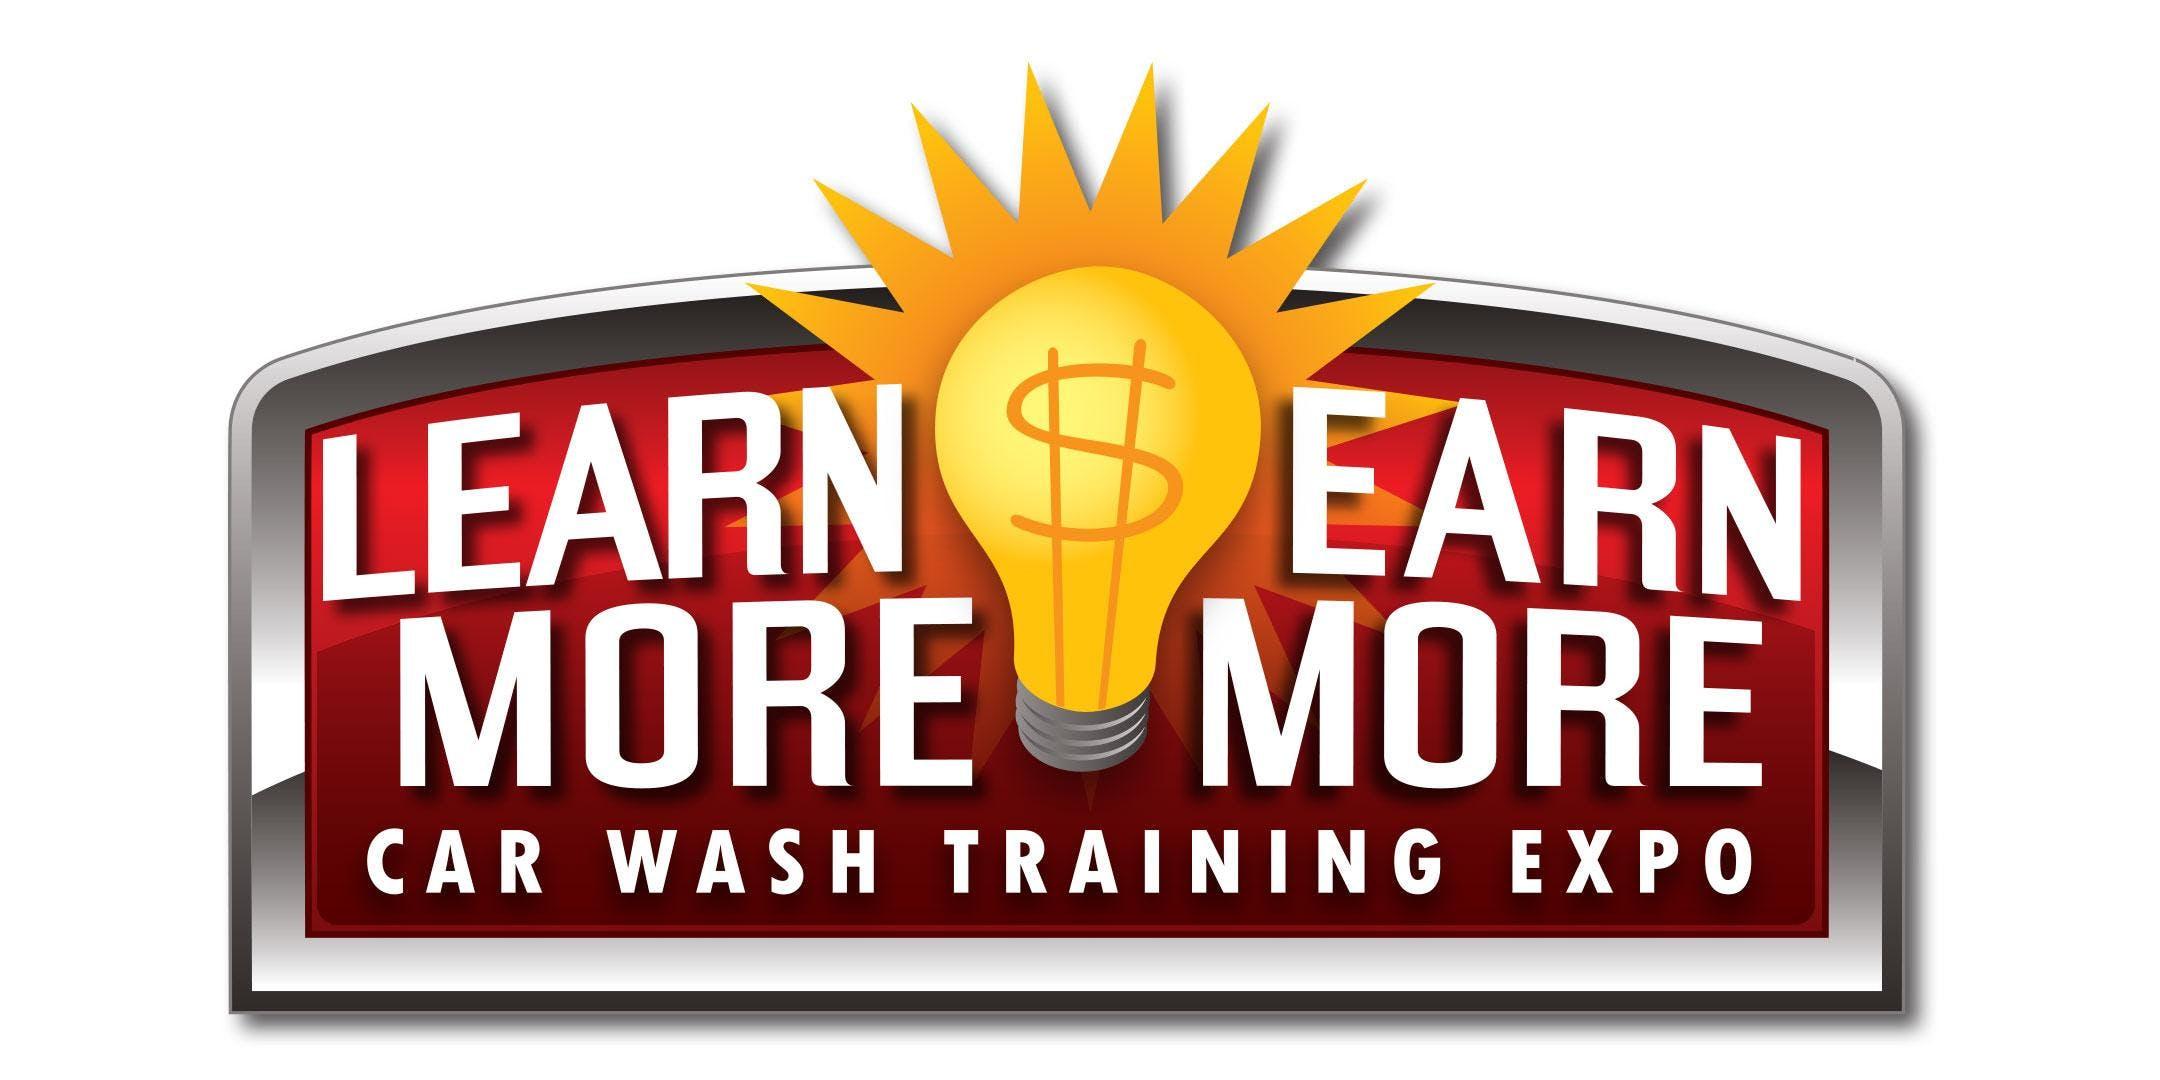 Learn More Earn More KleenRite Car Wash Expo NOV - Car wash show las vegas 2018